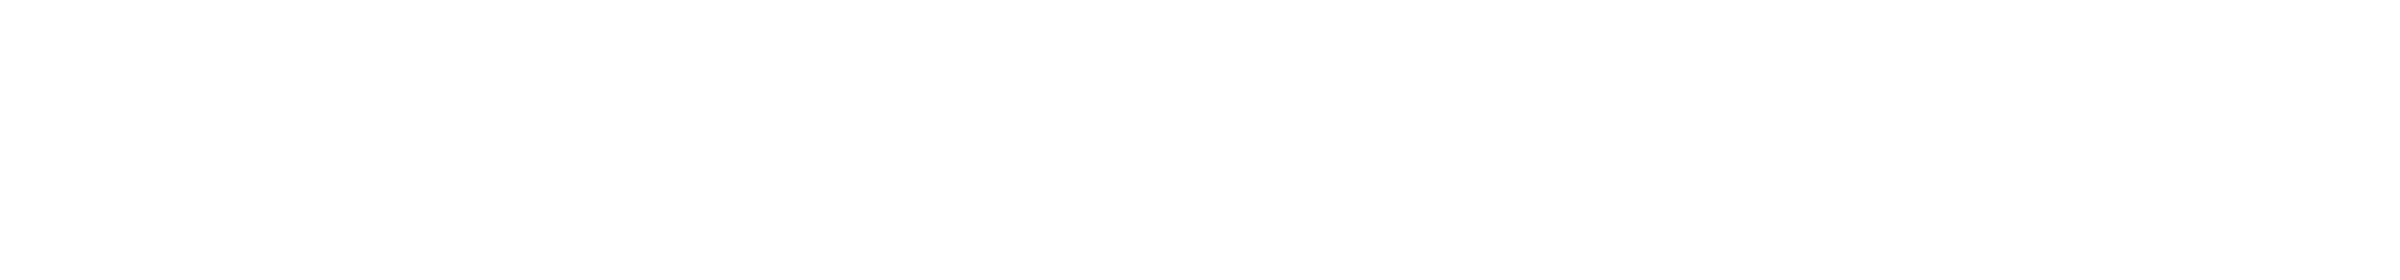 Envato Market api Logo PNG Transparent & SVG Vector